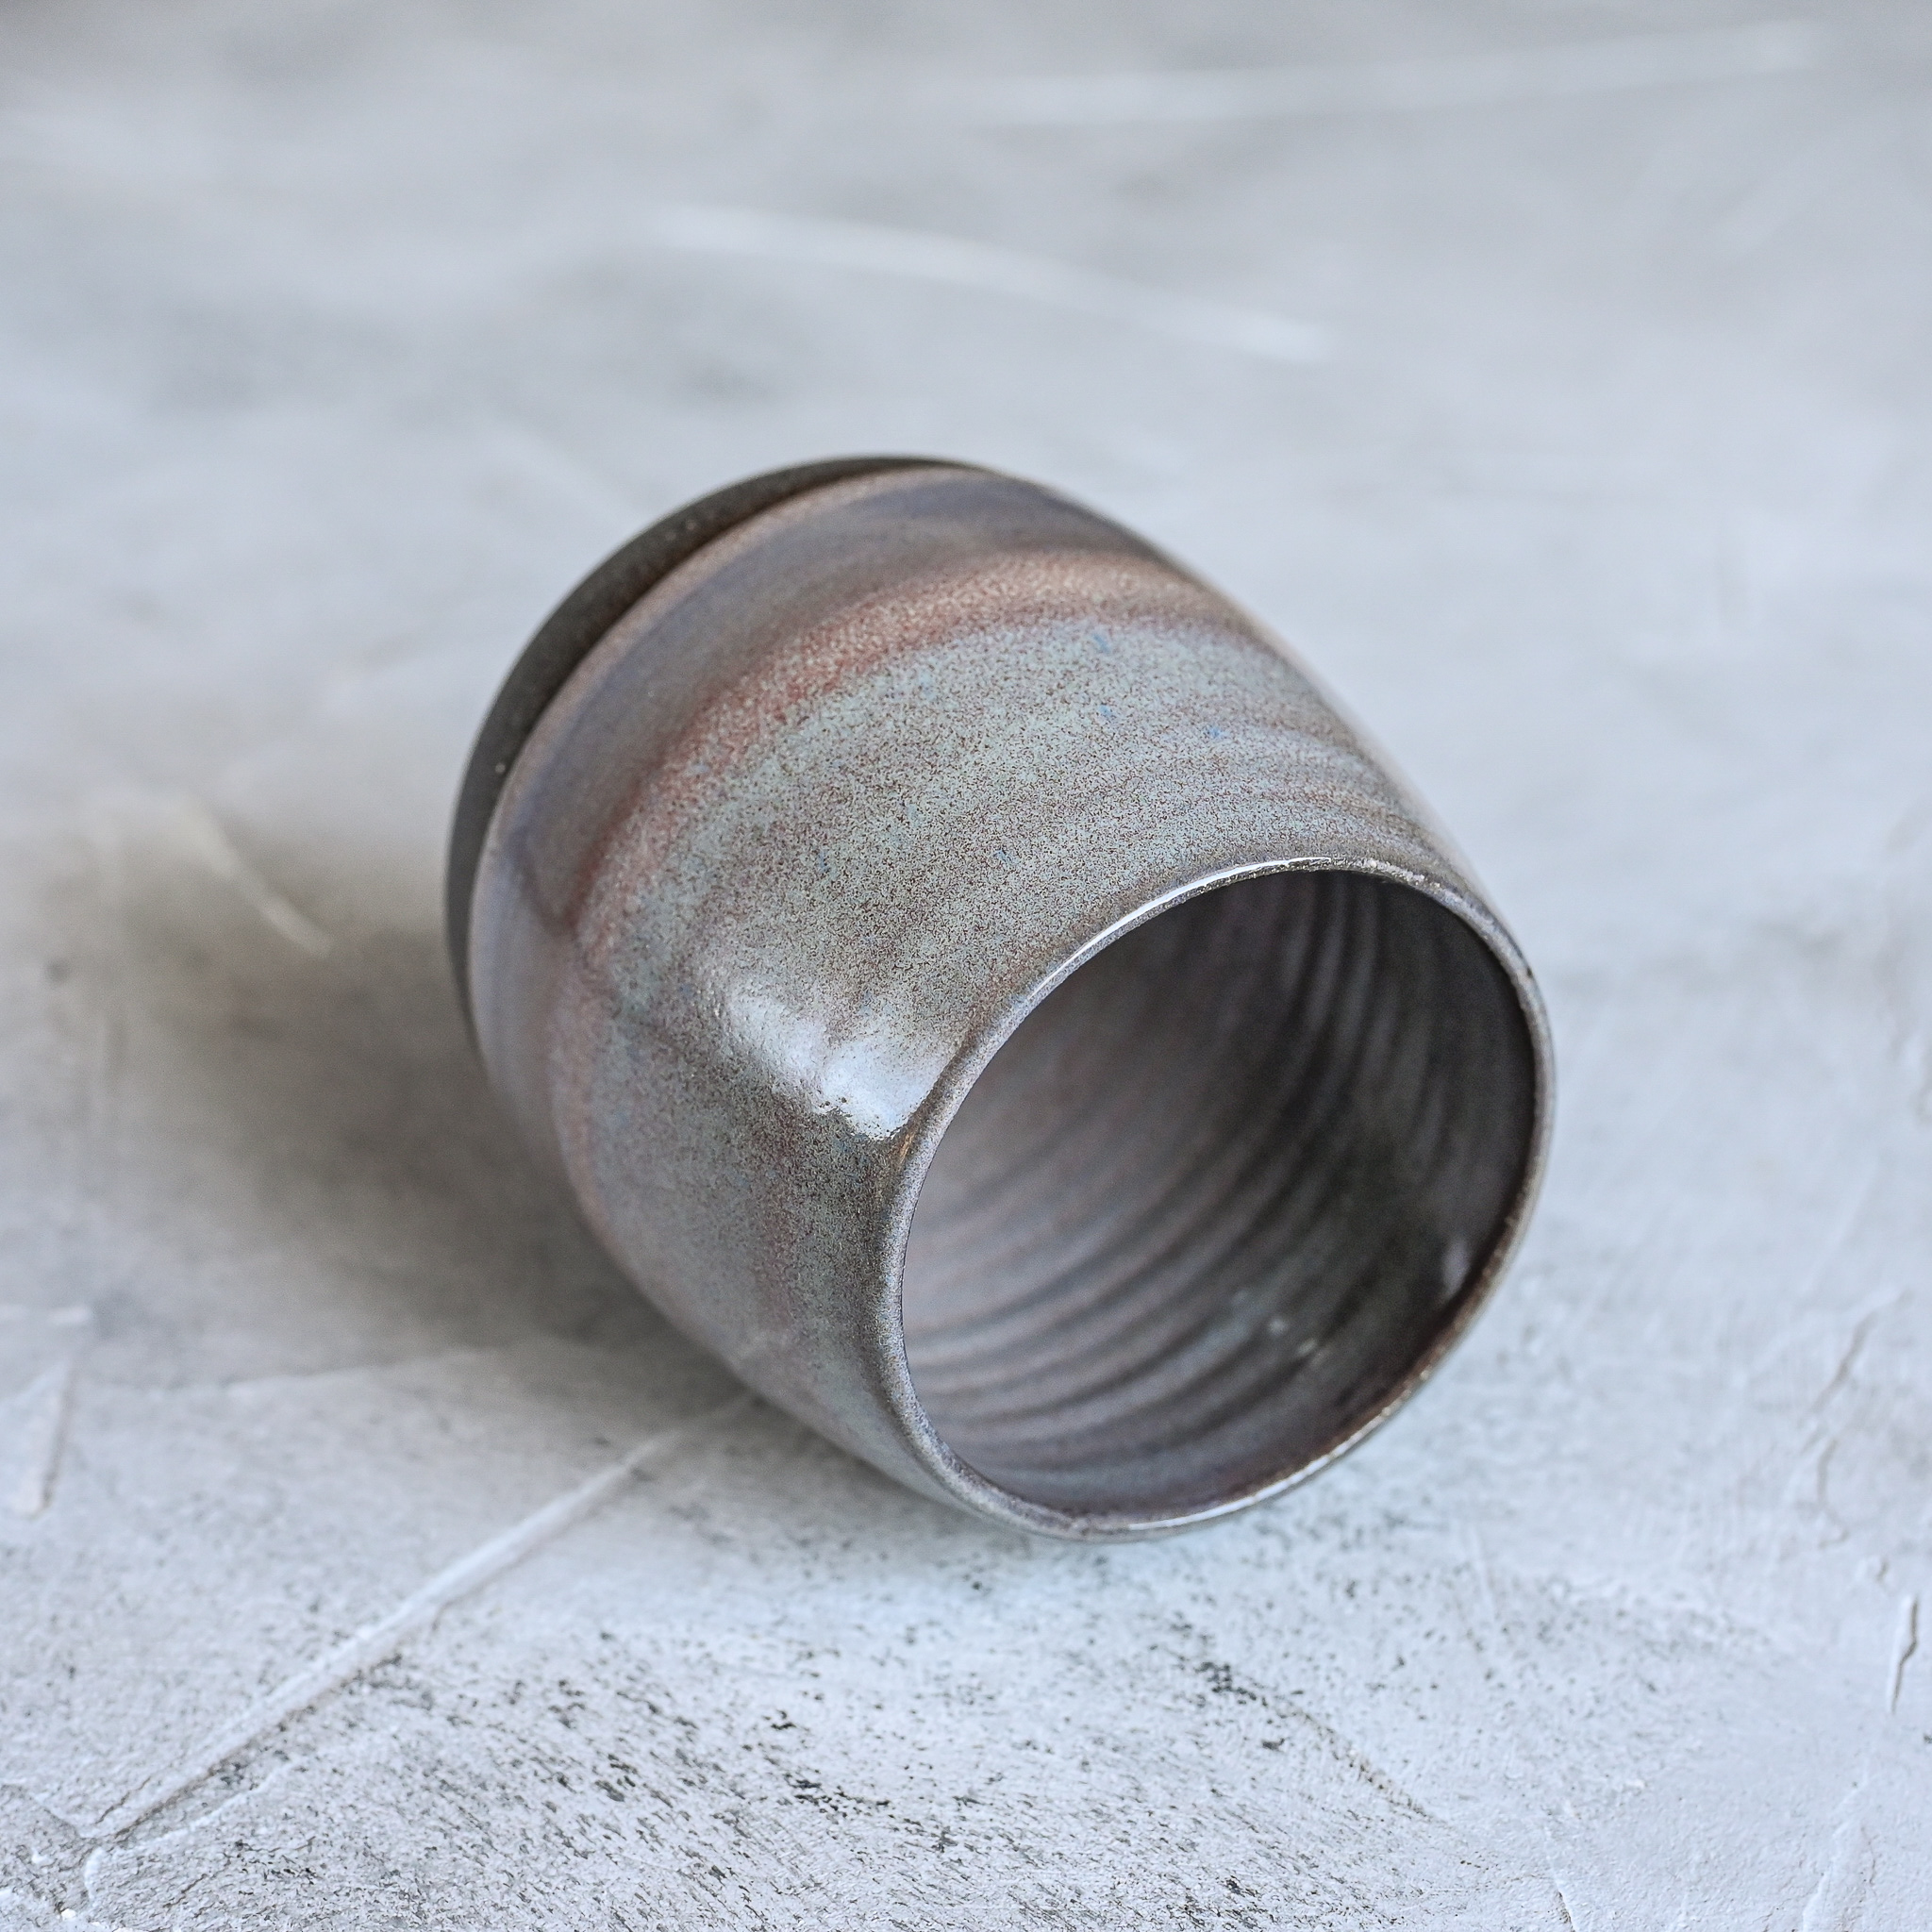 картинка Керамический стакан Марии Левиной малый 1 - DishWishes.Ru